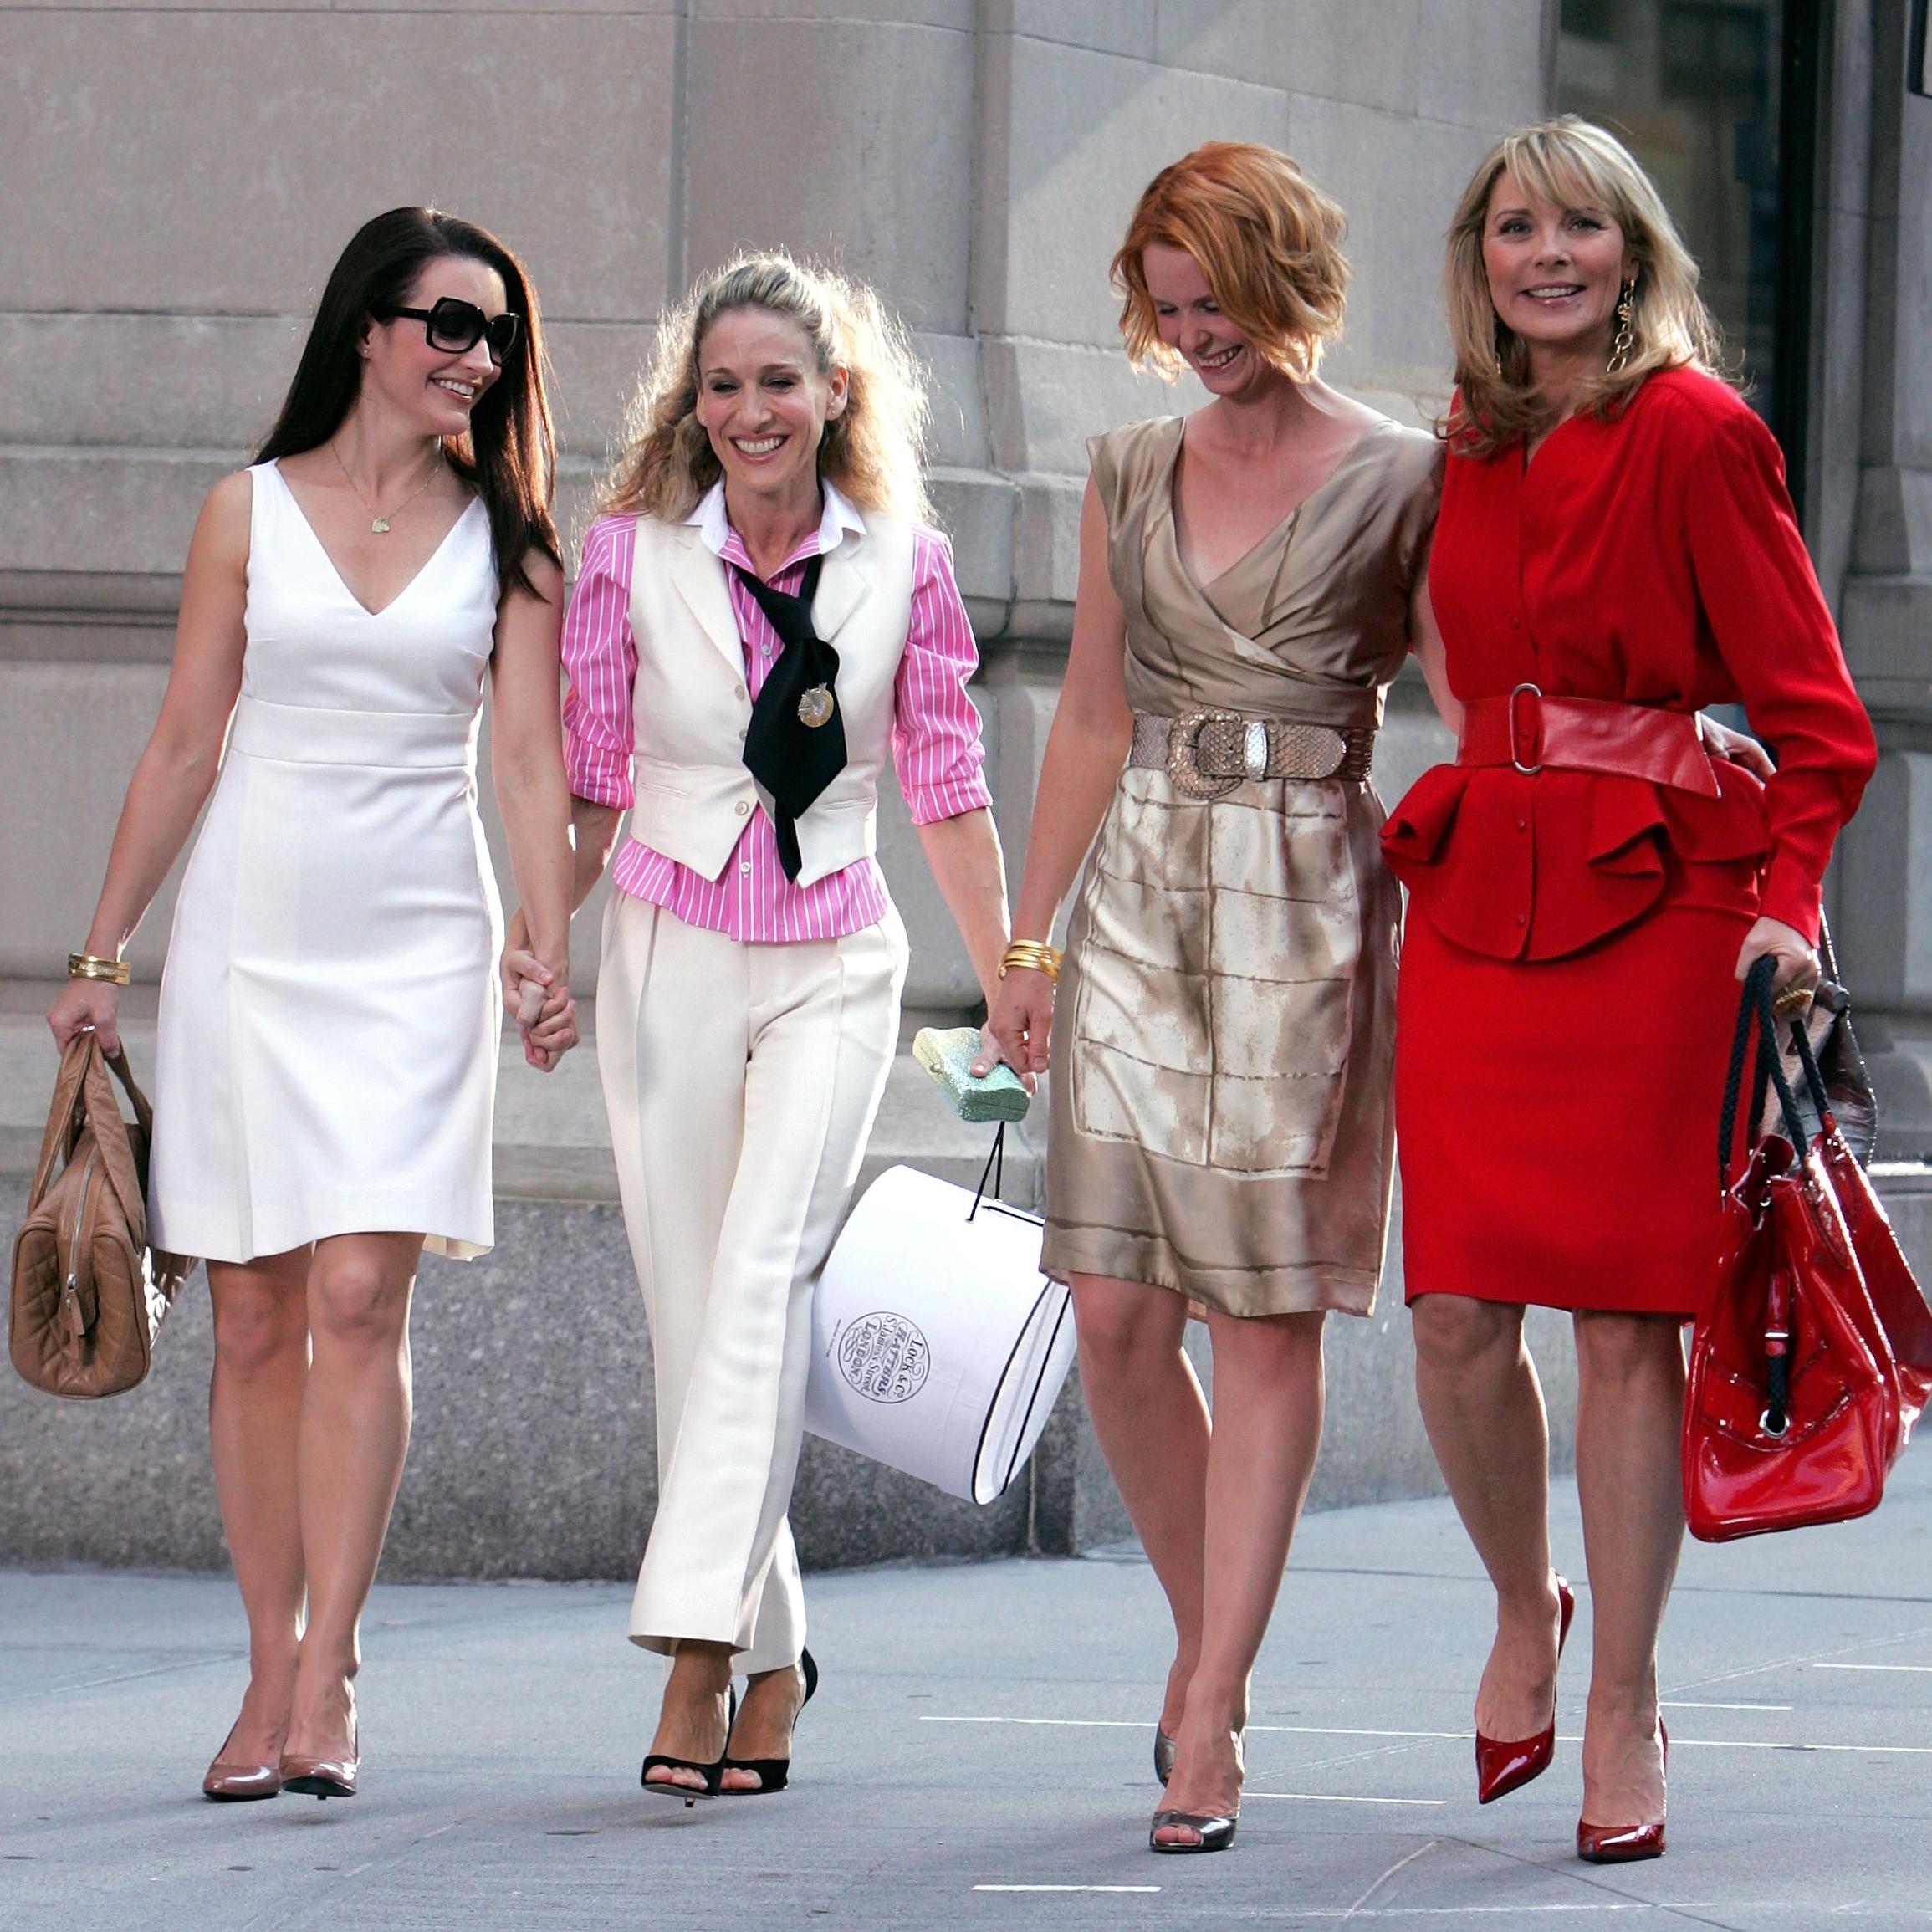 sex-and-the-city-cast-new-york-city.jpg